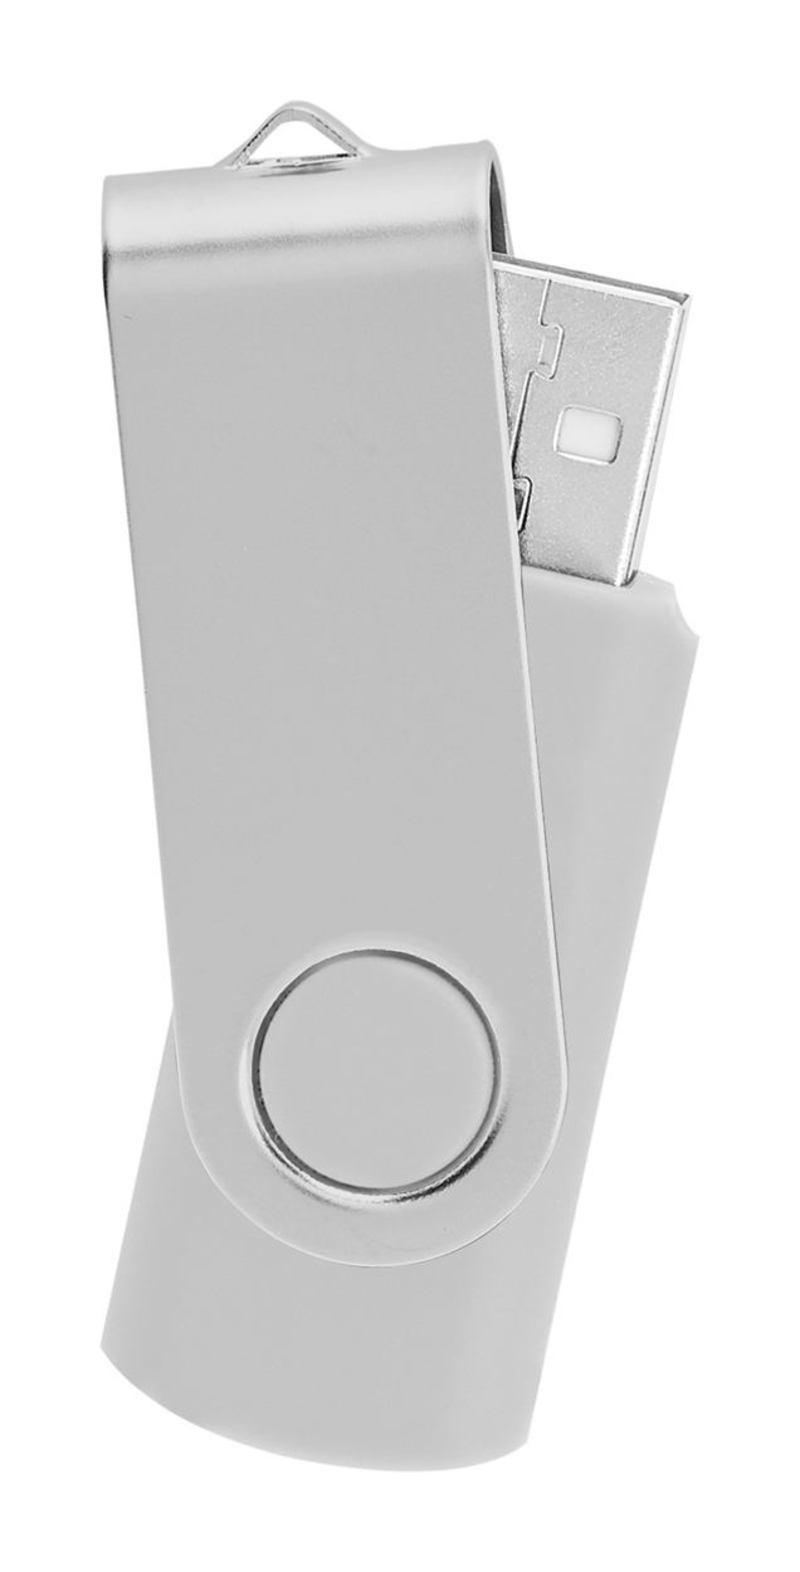 Survet 8GB USB flash drive